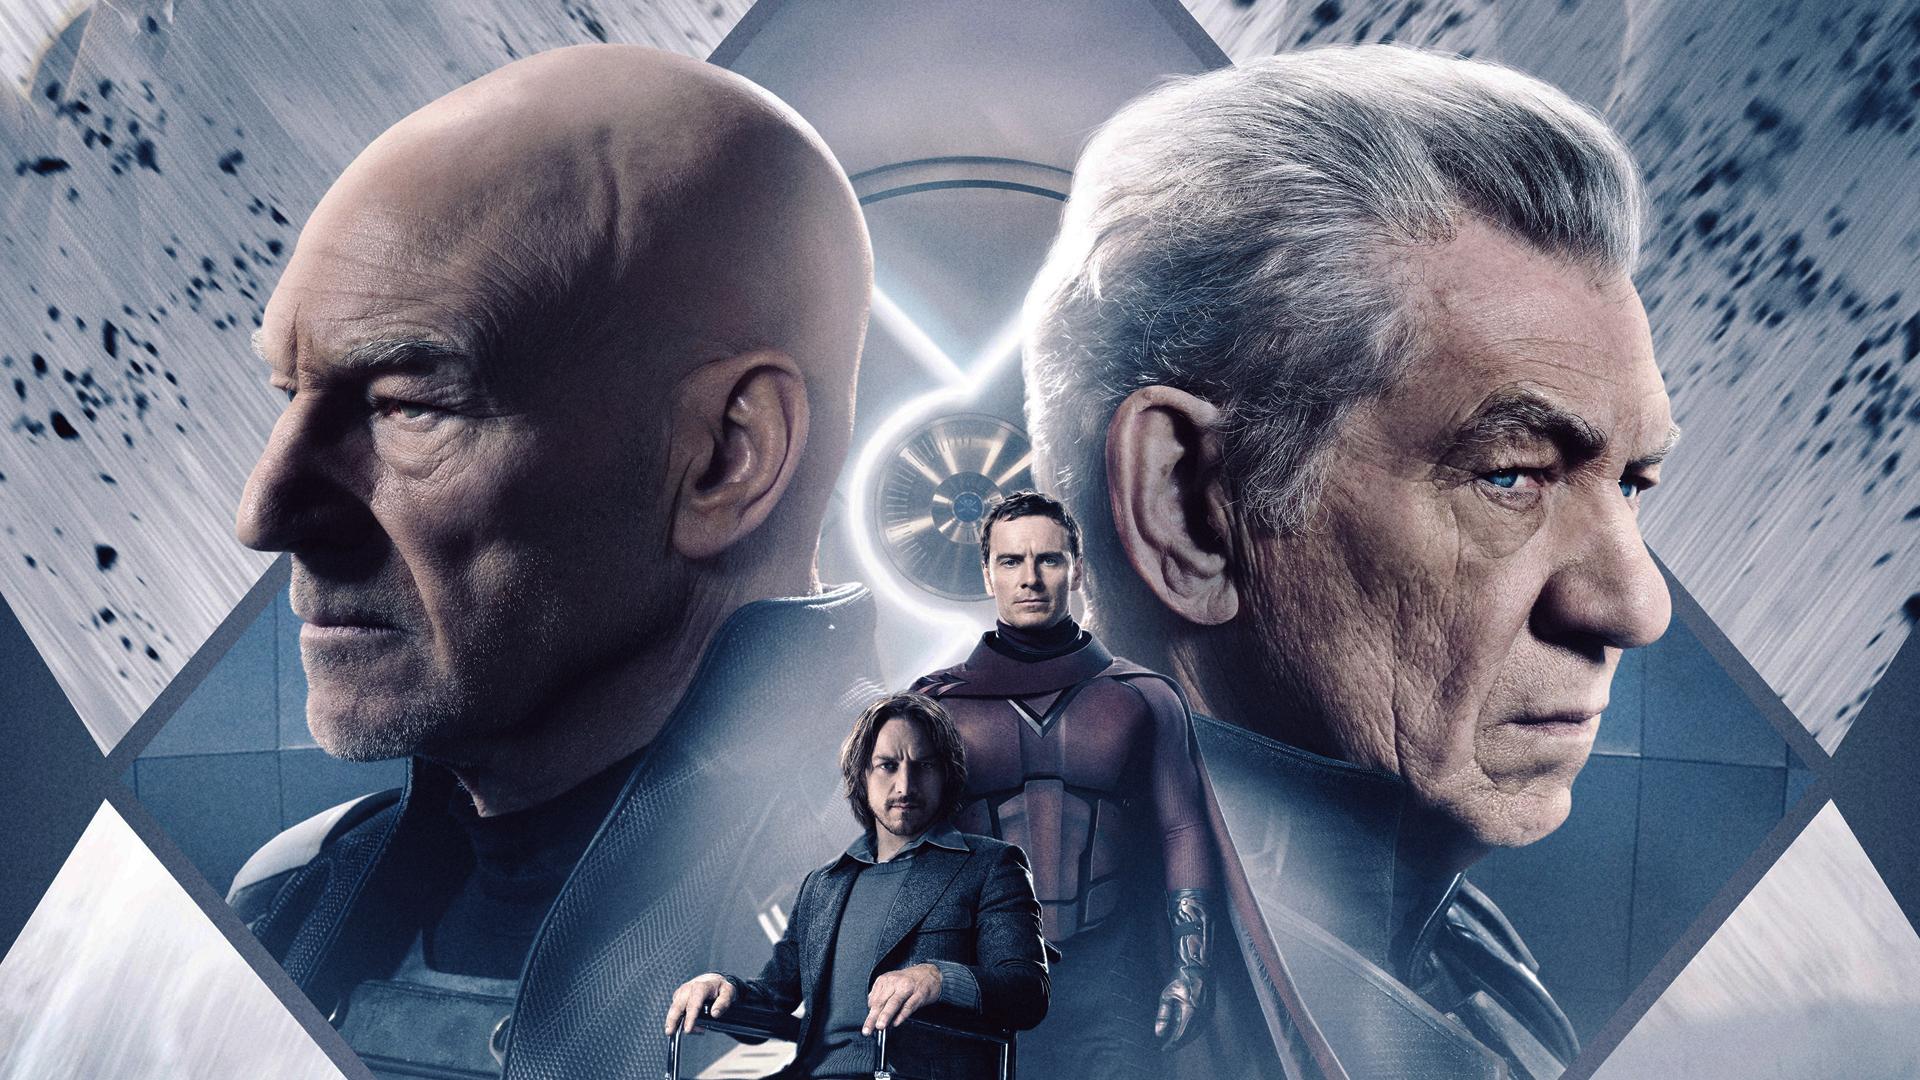 File Name   x-men-days-of-future-past-professor-x-magneto-1920x1080    X Men Days Of Future Past Professor X